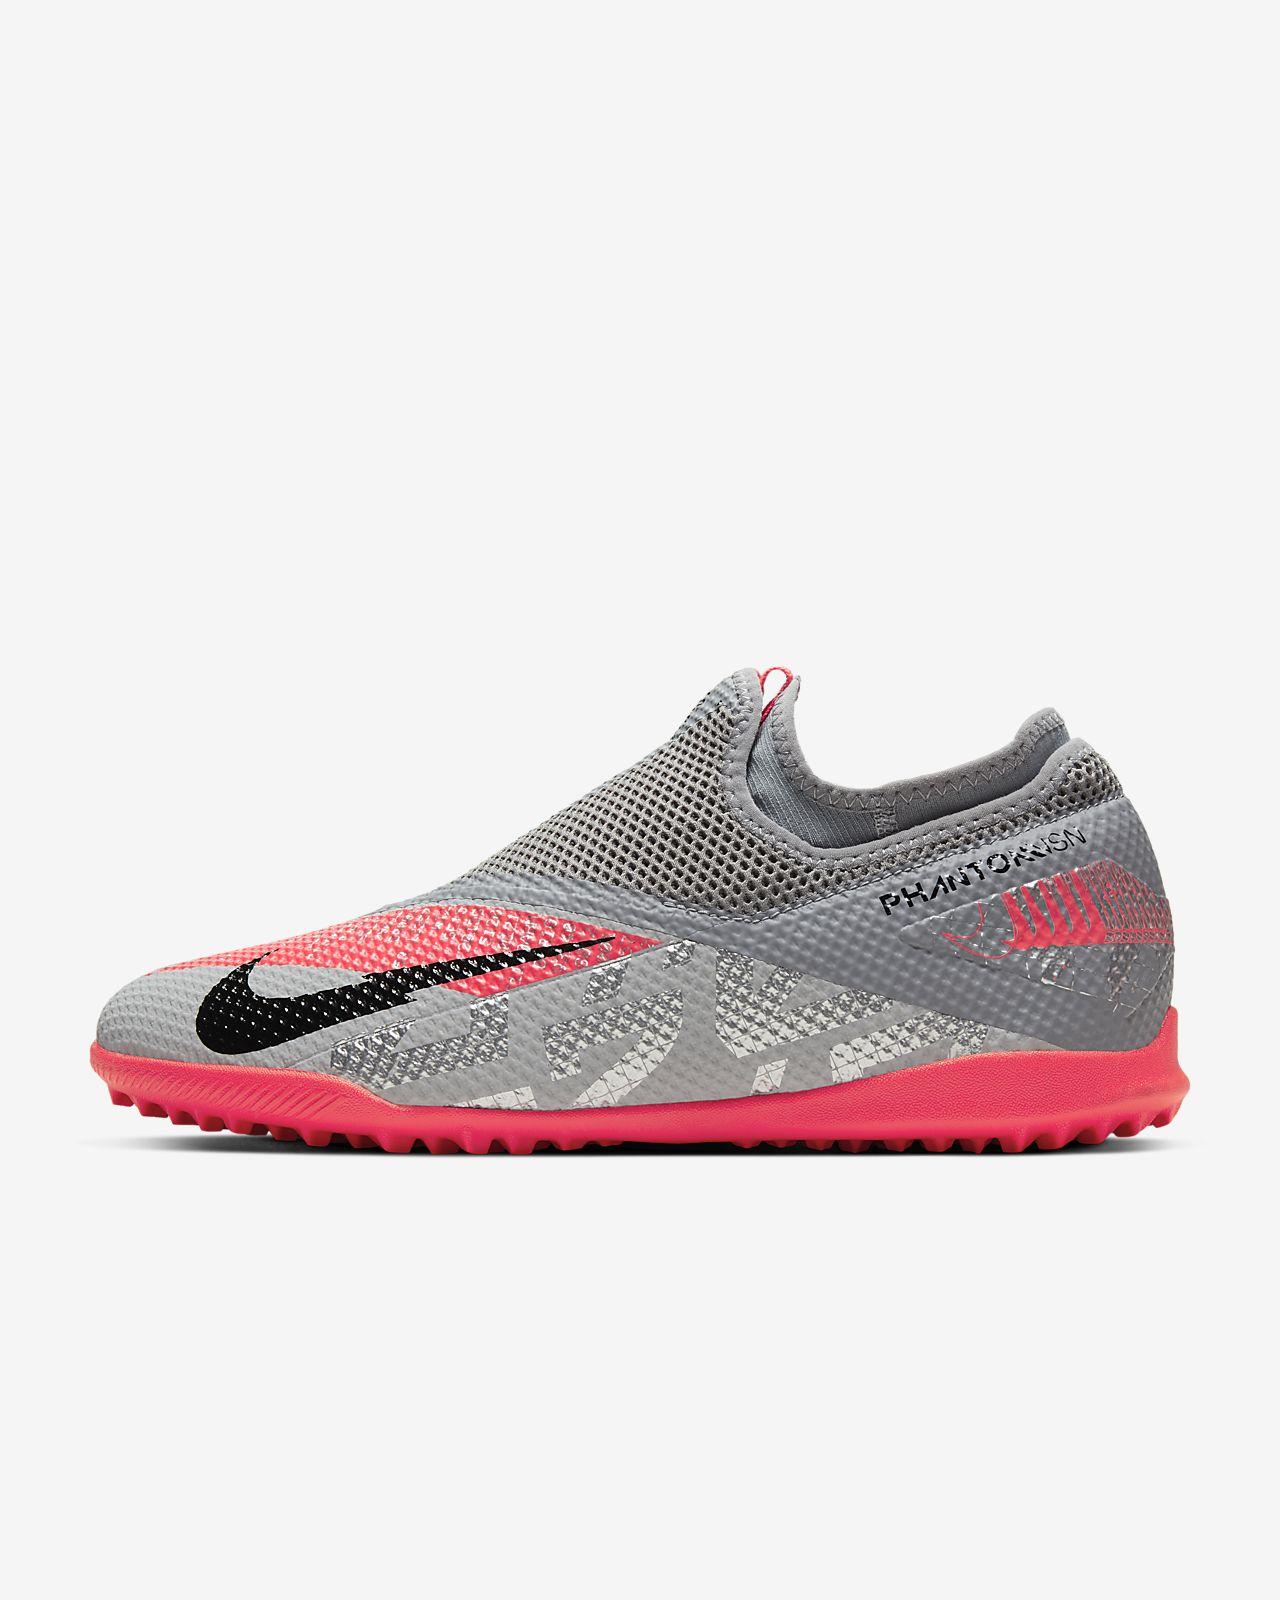 Nike Phantom Vision 2 Academy Dynamic Fit TF Artificial-Turf Football Shoe